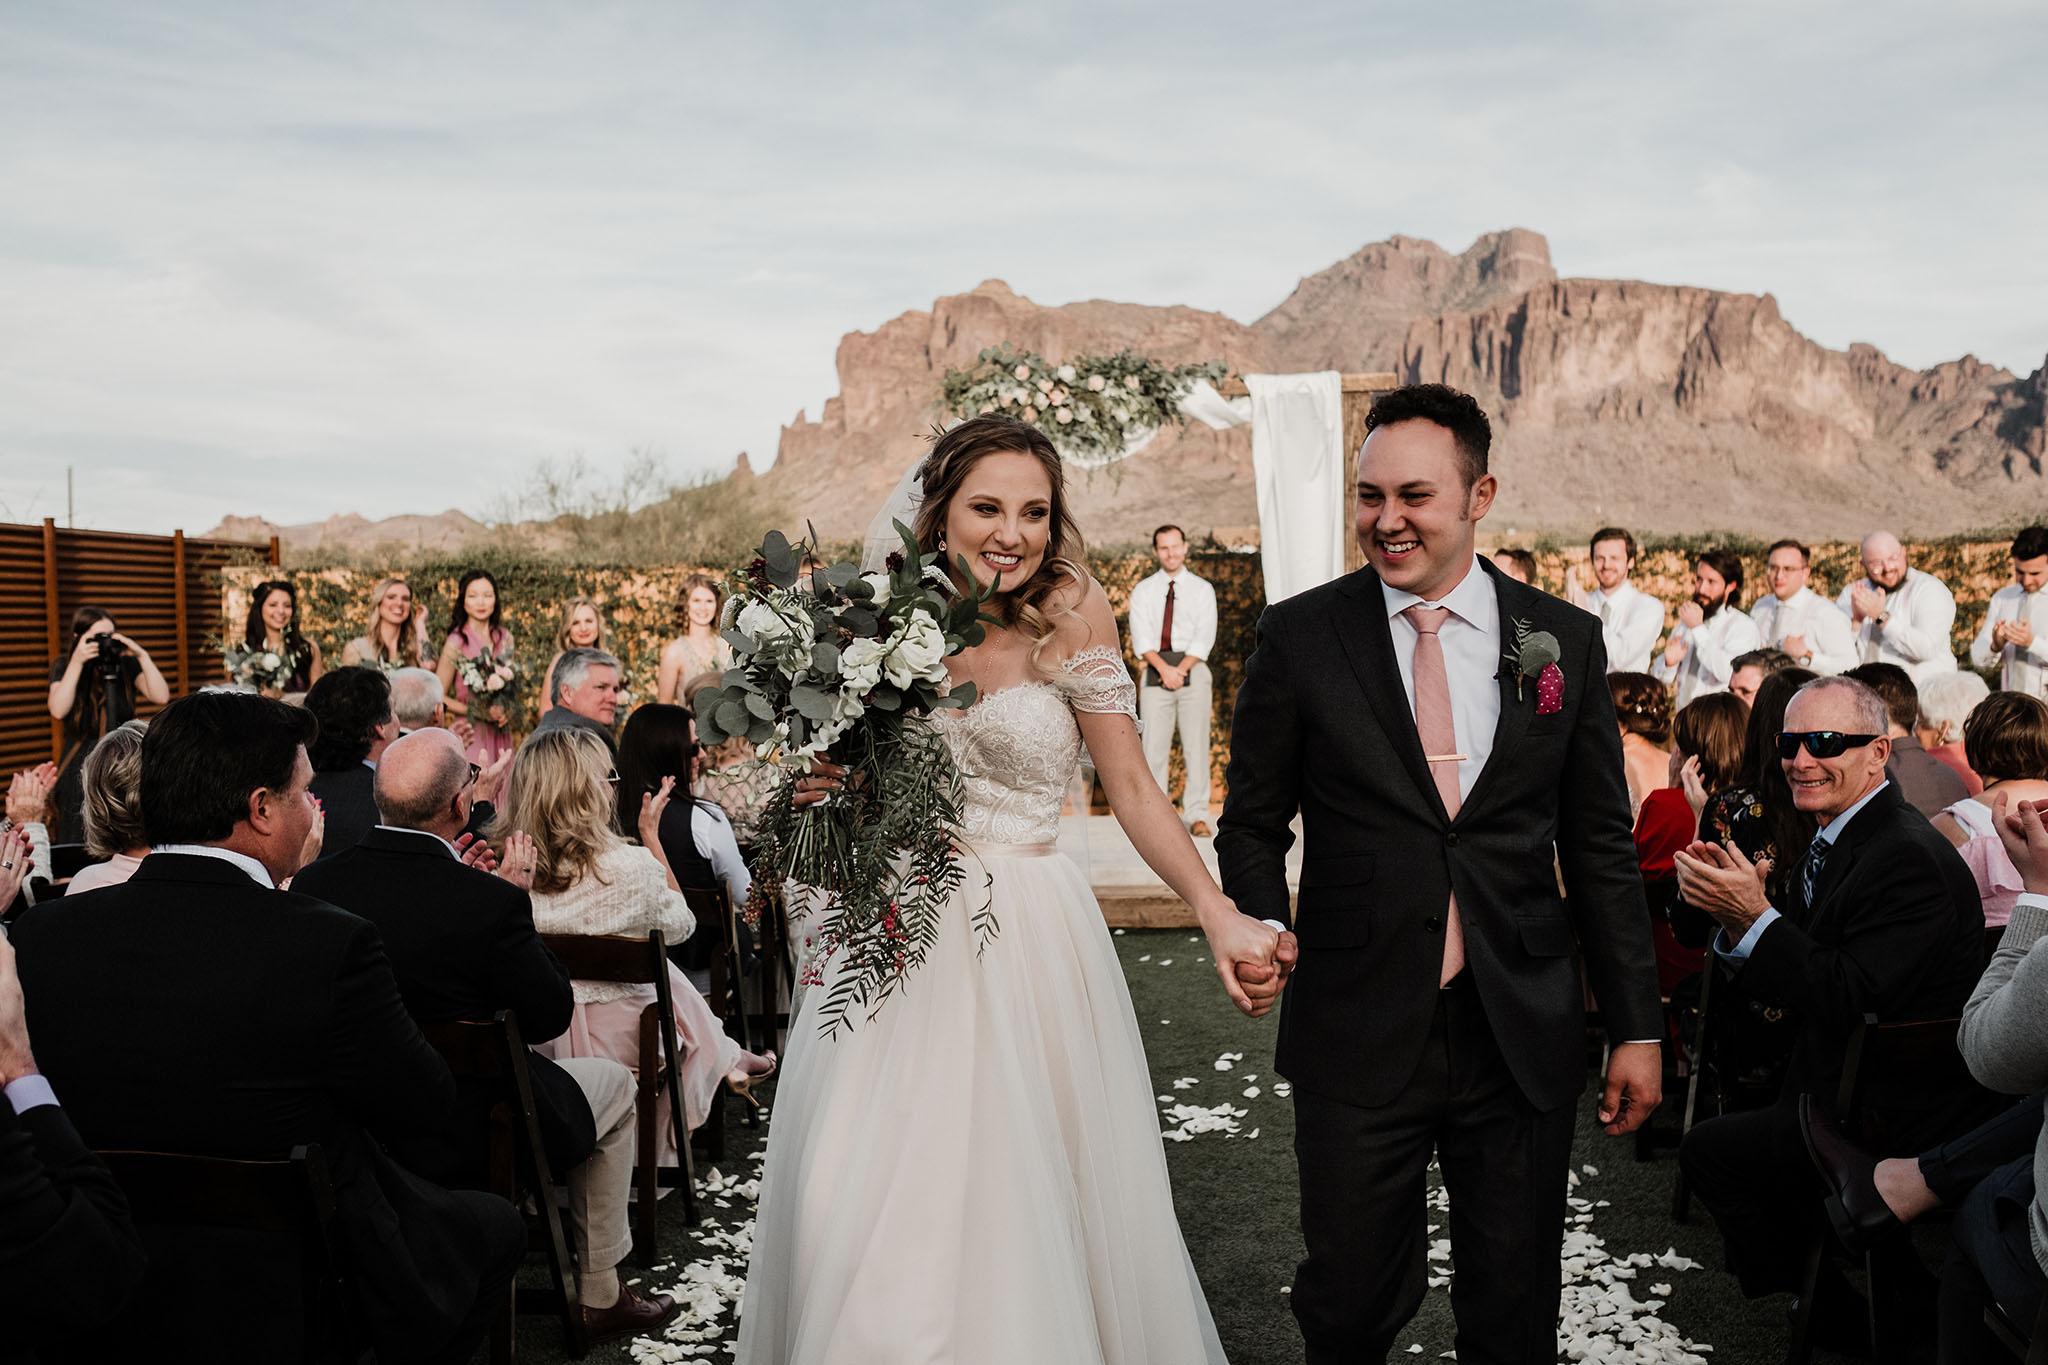 Arizona-Wedding-Photographer-The-Paseo-Venue25.jpg